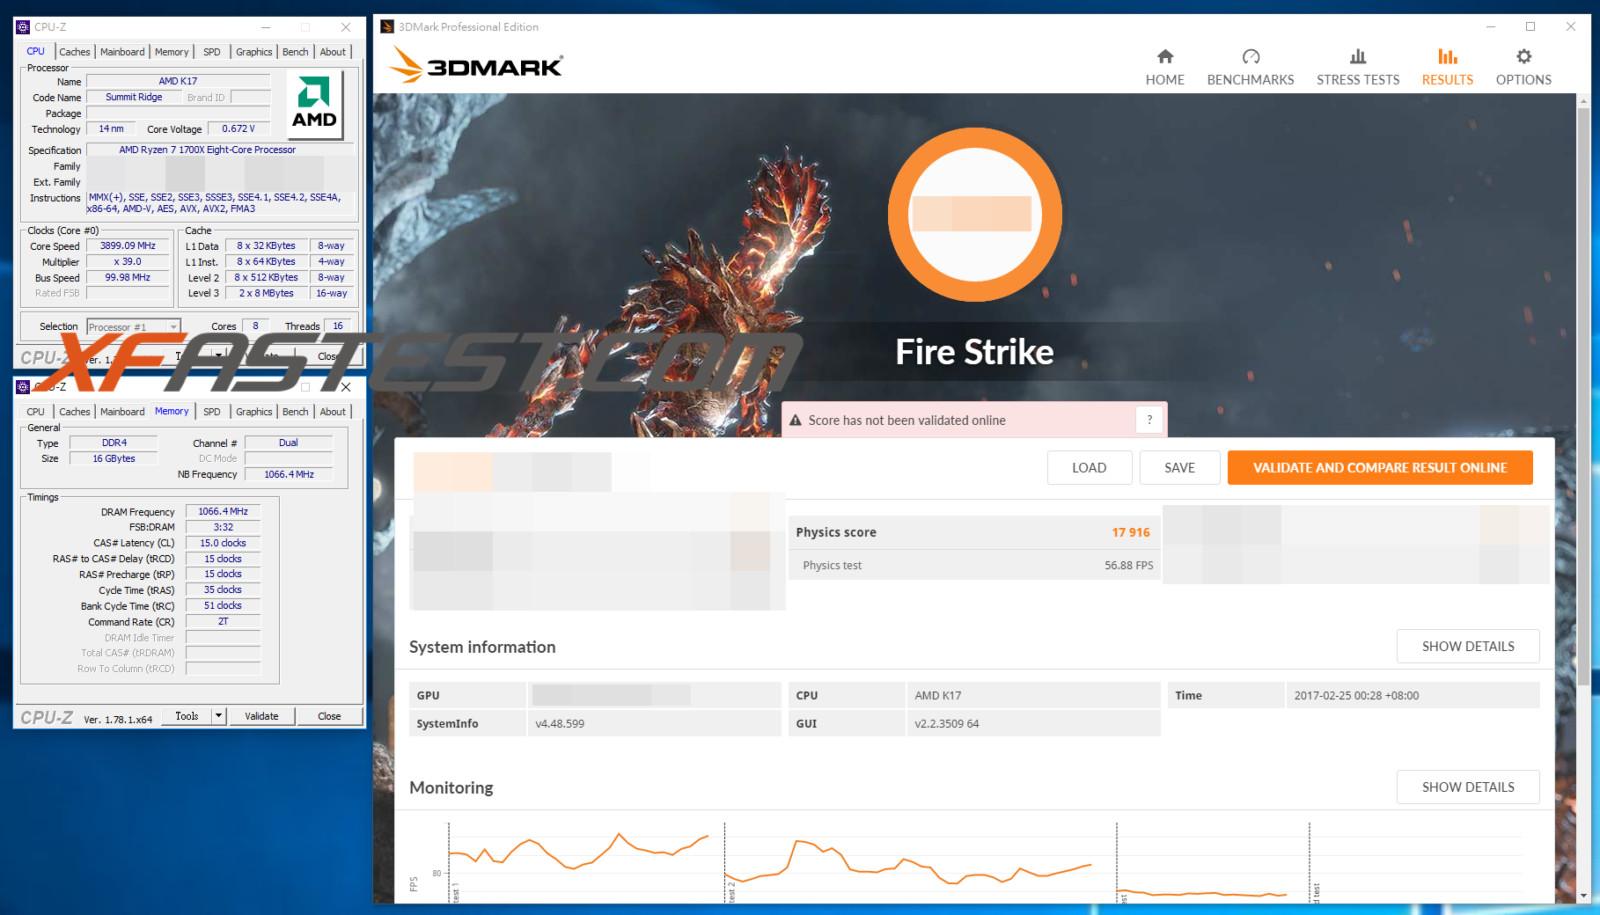 ✨ Torrent 3dmark 2017 | 3DMark Professional Edition 2017 v2